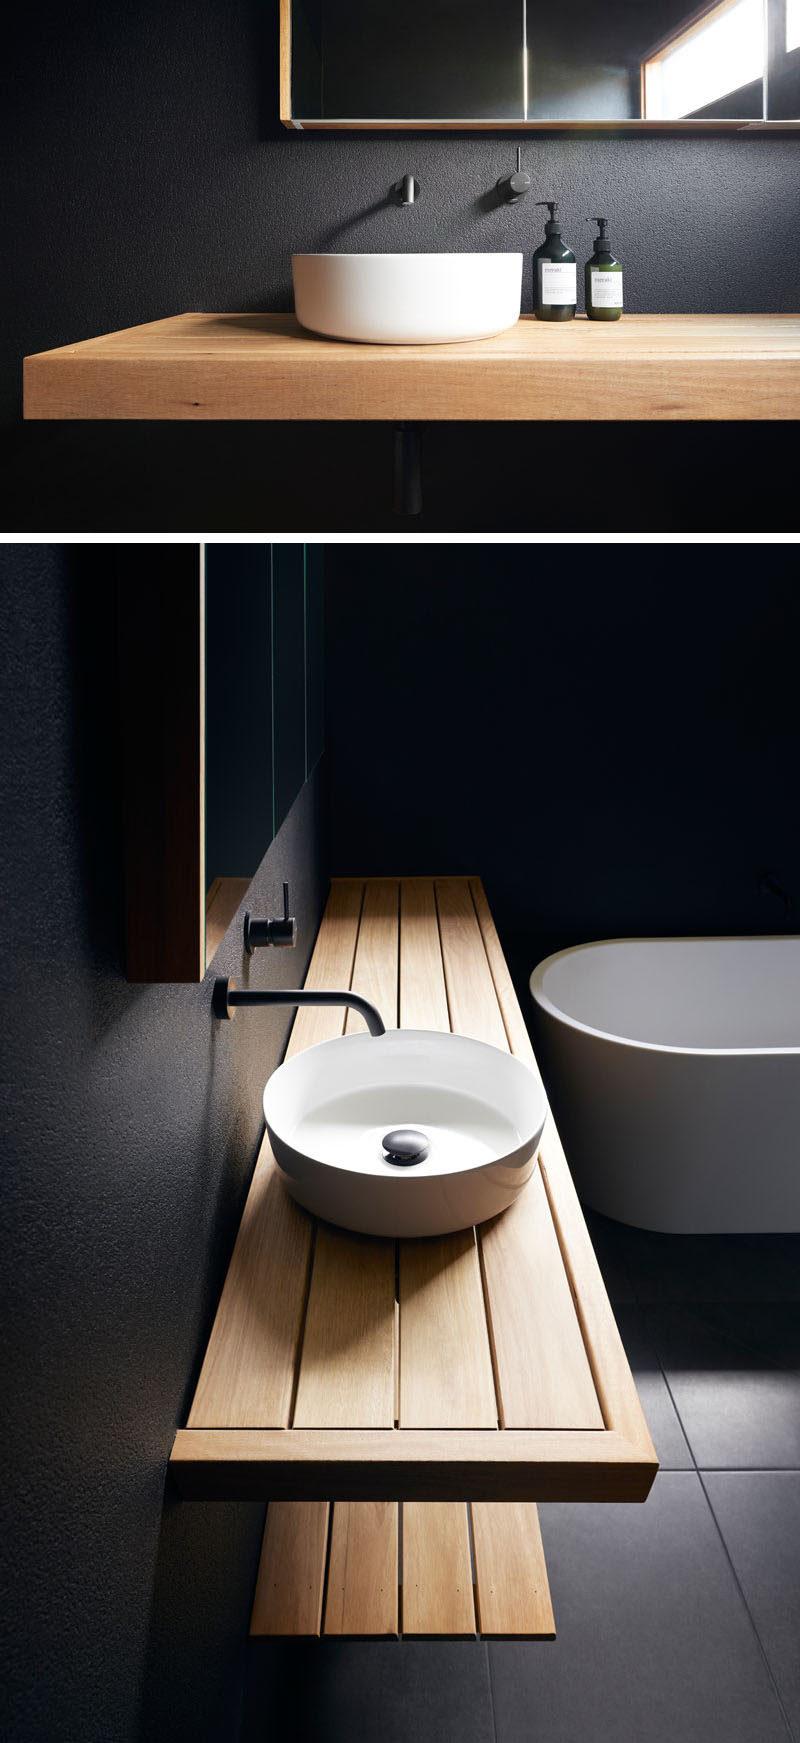 This modern bathroom has matte black walls, a wood vanity, and a white basin and bathtub. #BlackBathroom #ModernBathroom